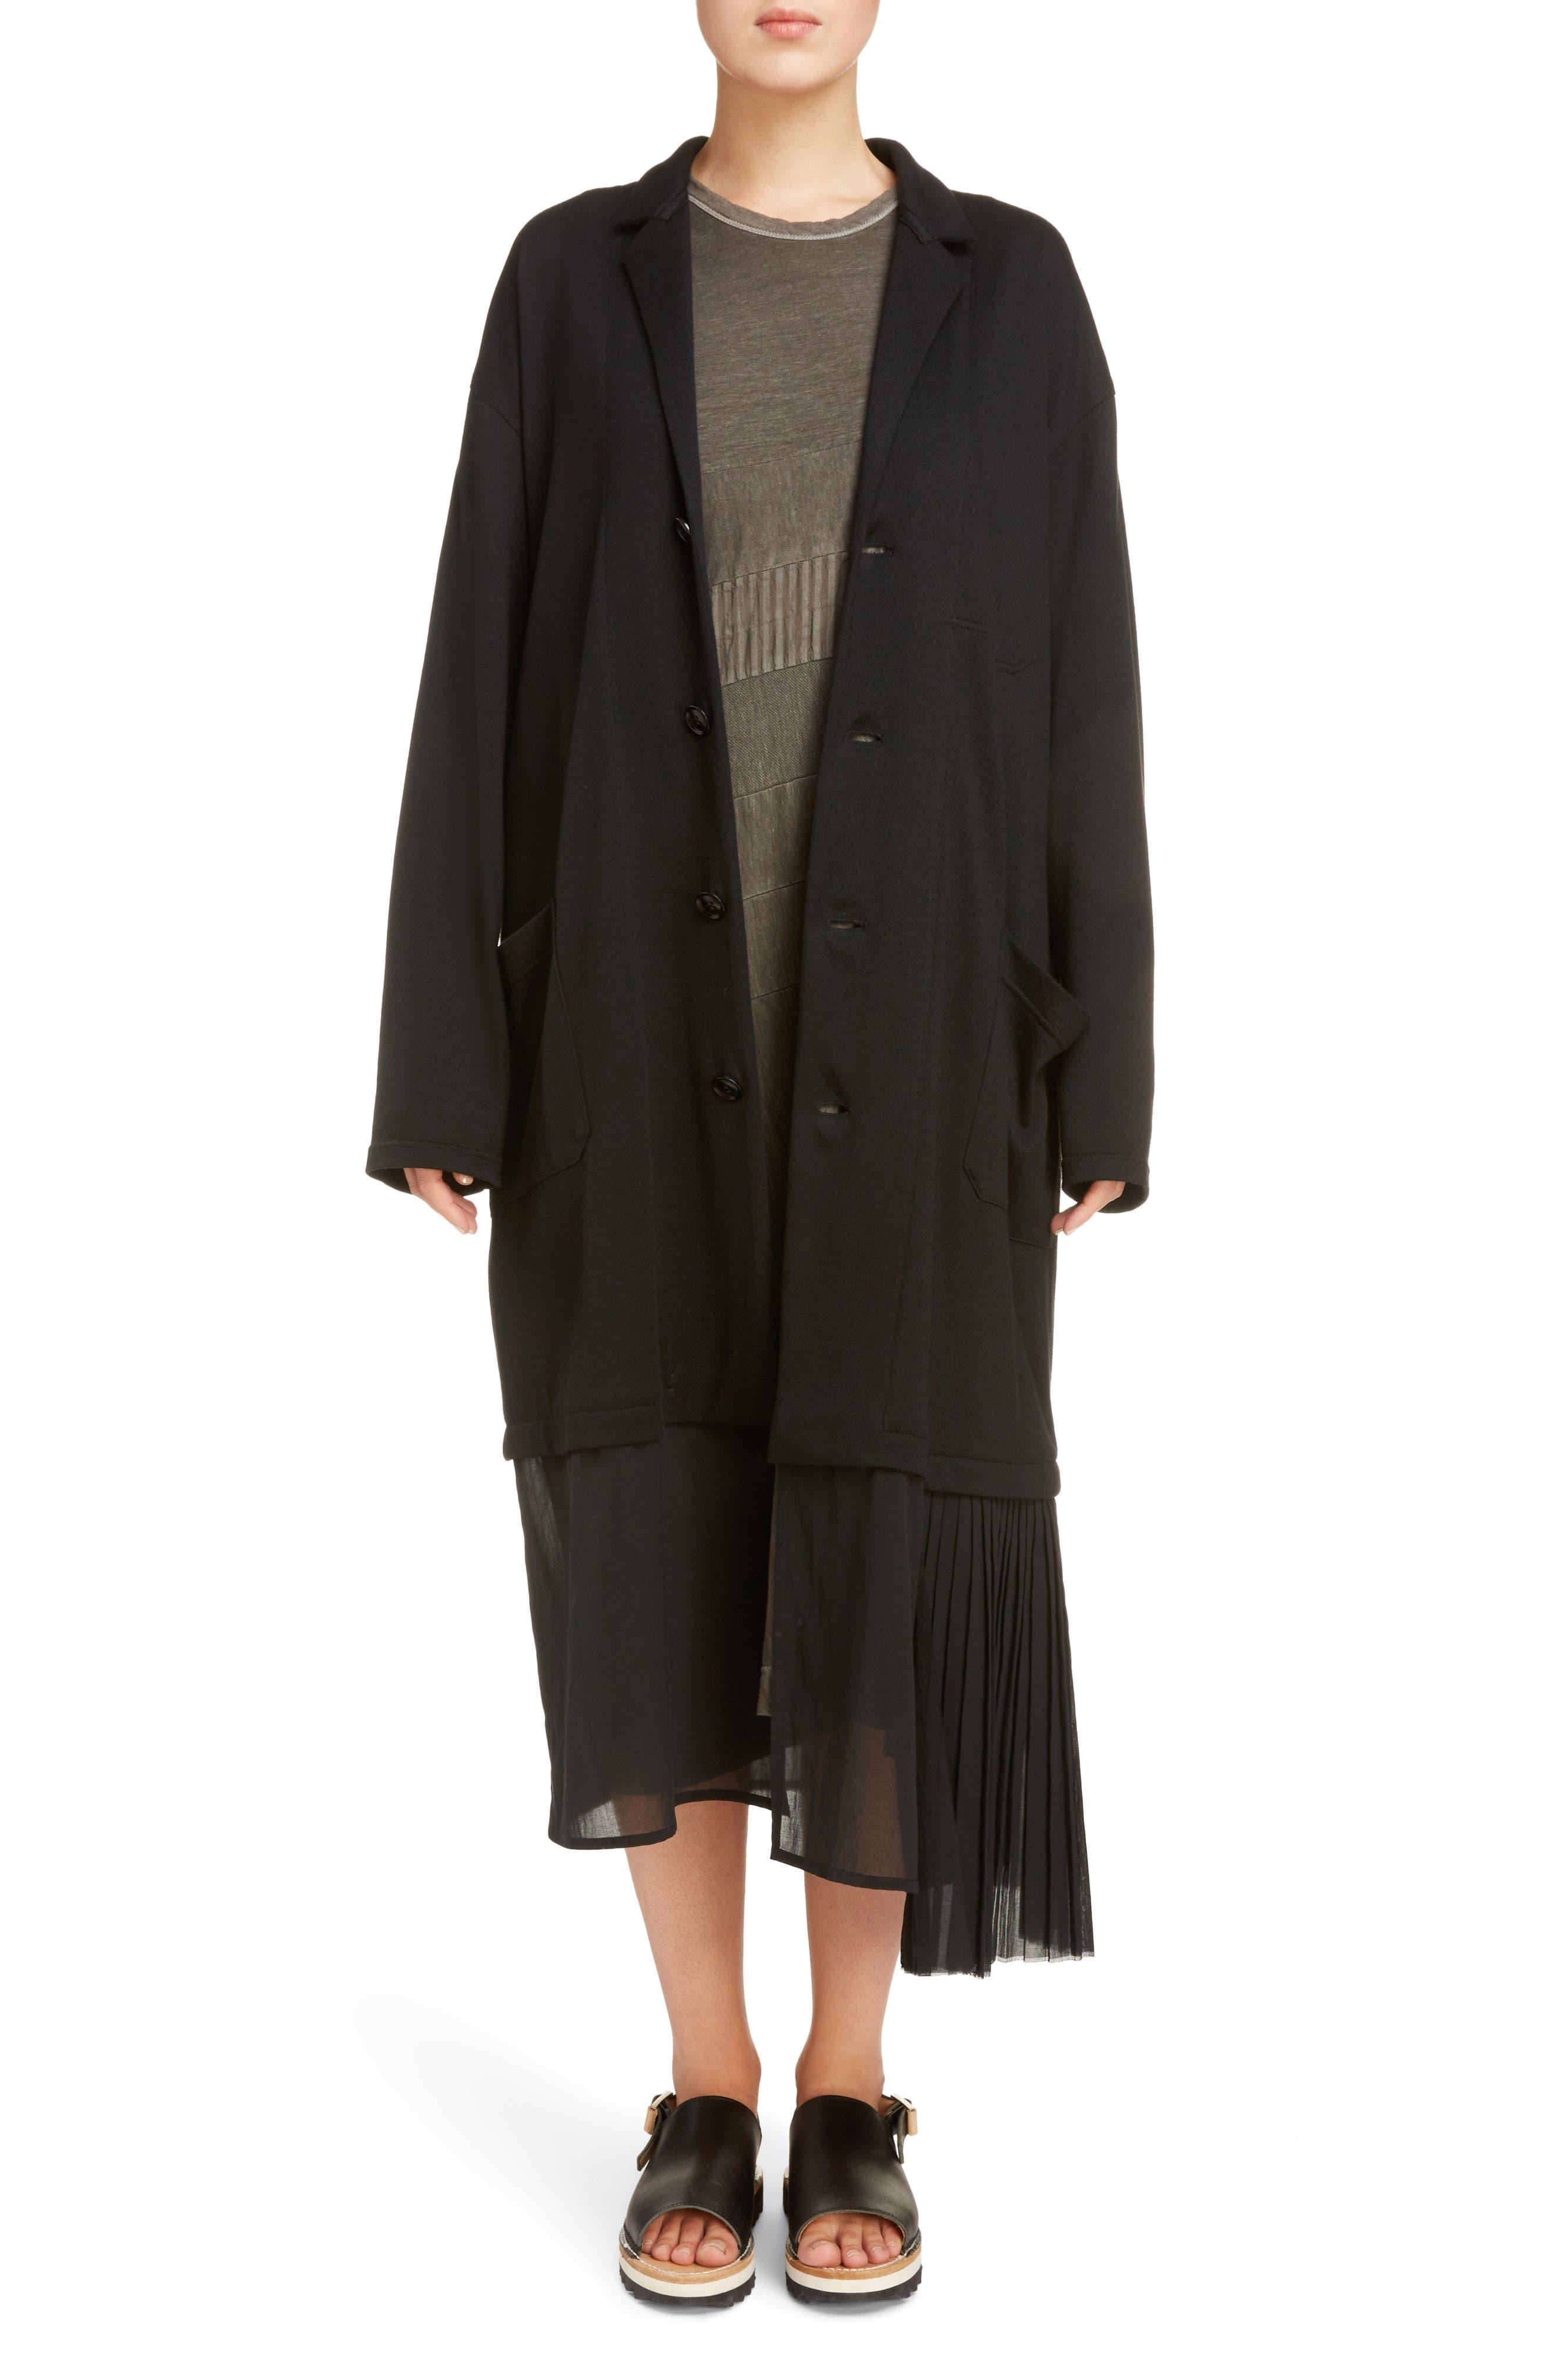 Y's by Yohji Yamamoto Tulle Hem Coat